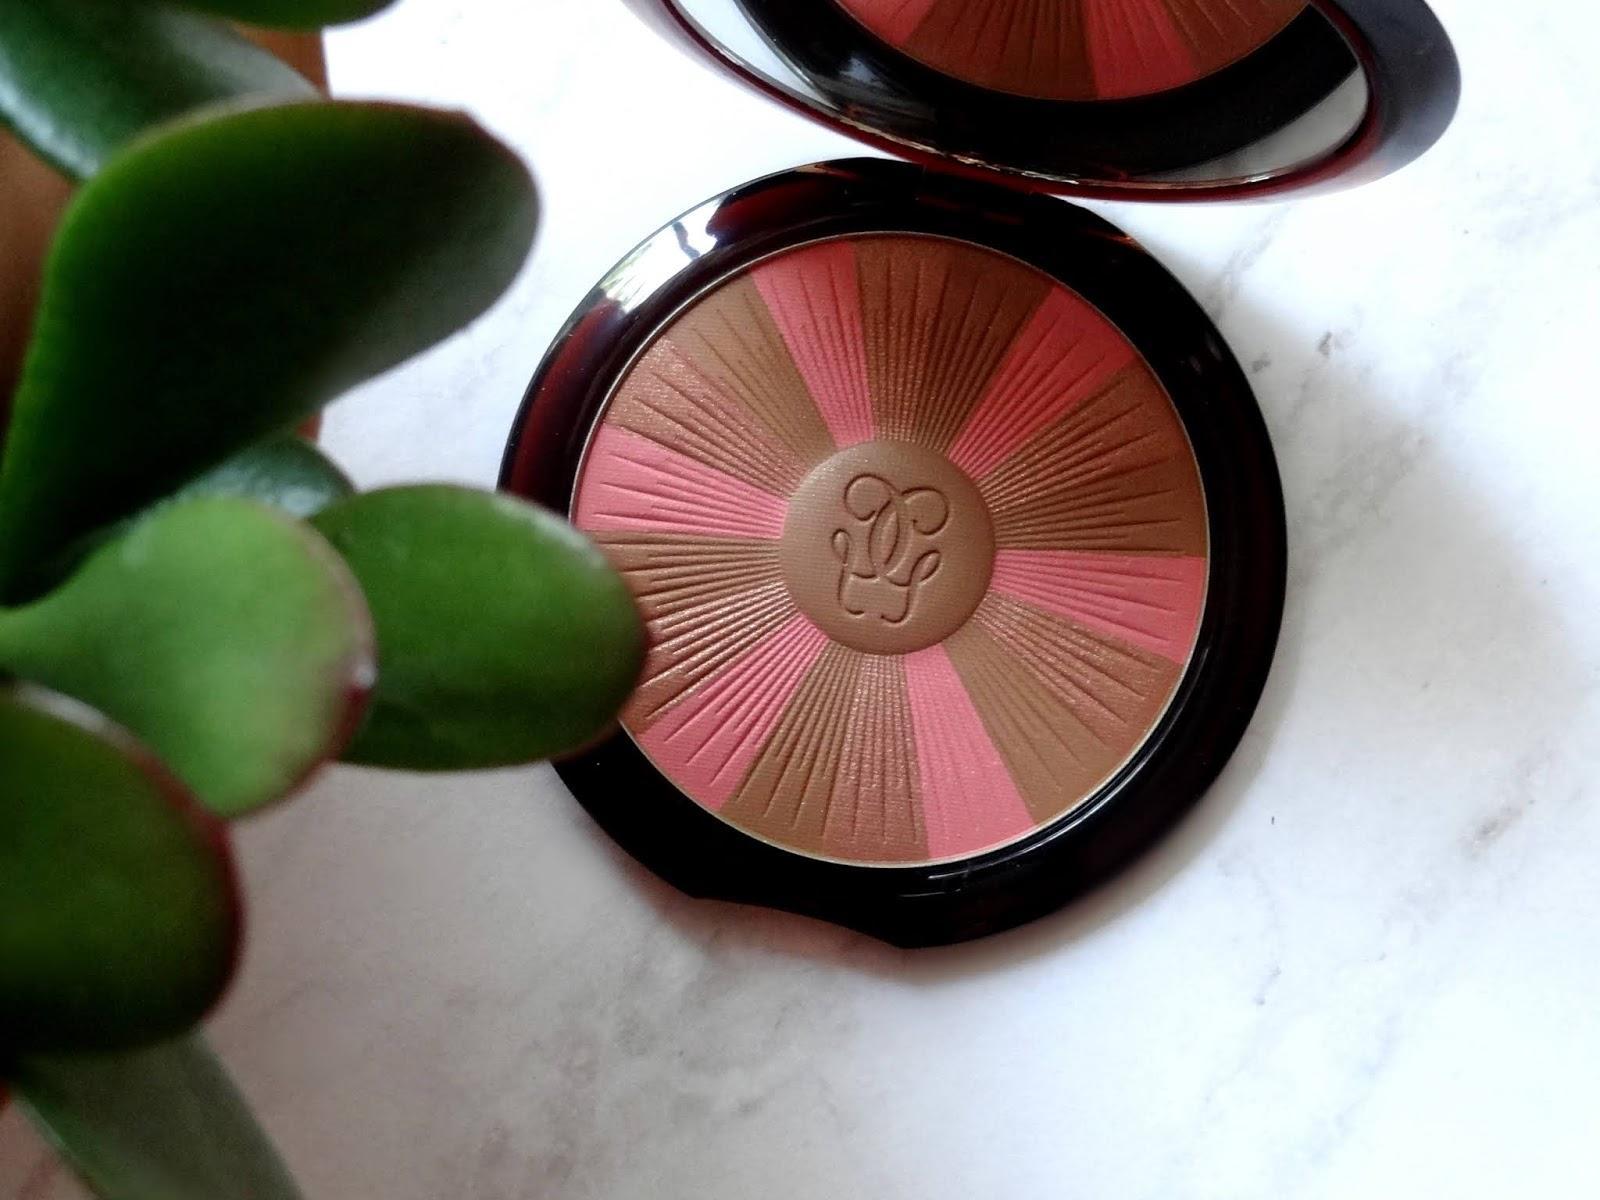 Makeup, Beauty and More: Guerlain Terracotta Light Healthy ...